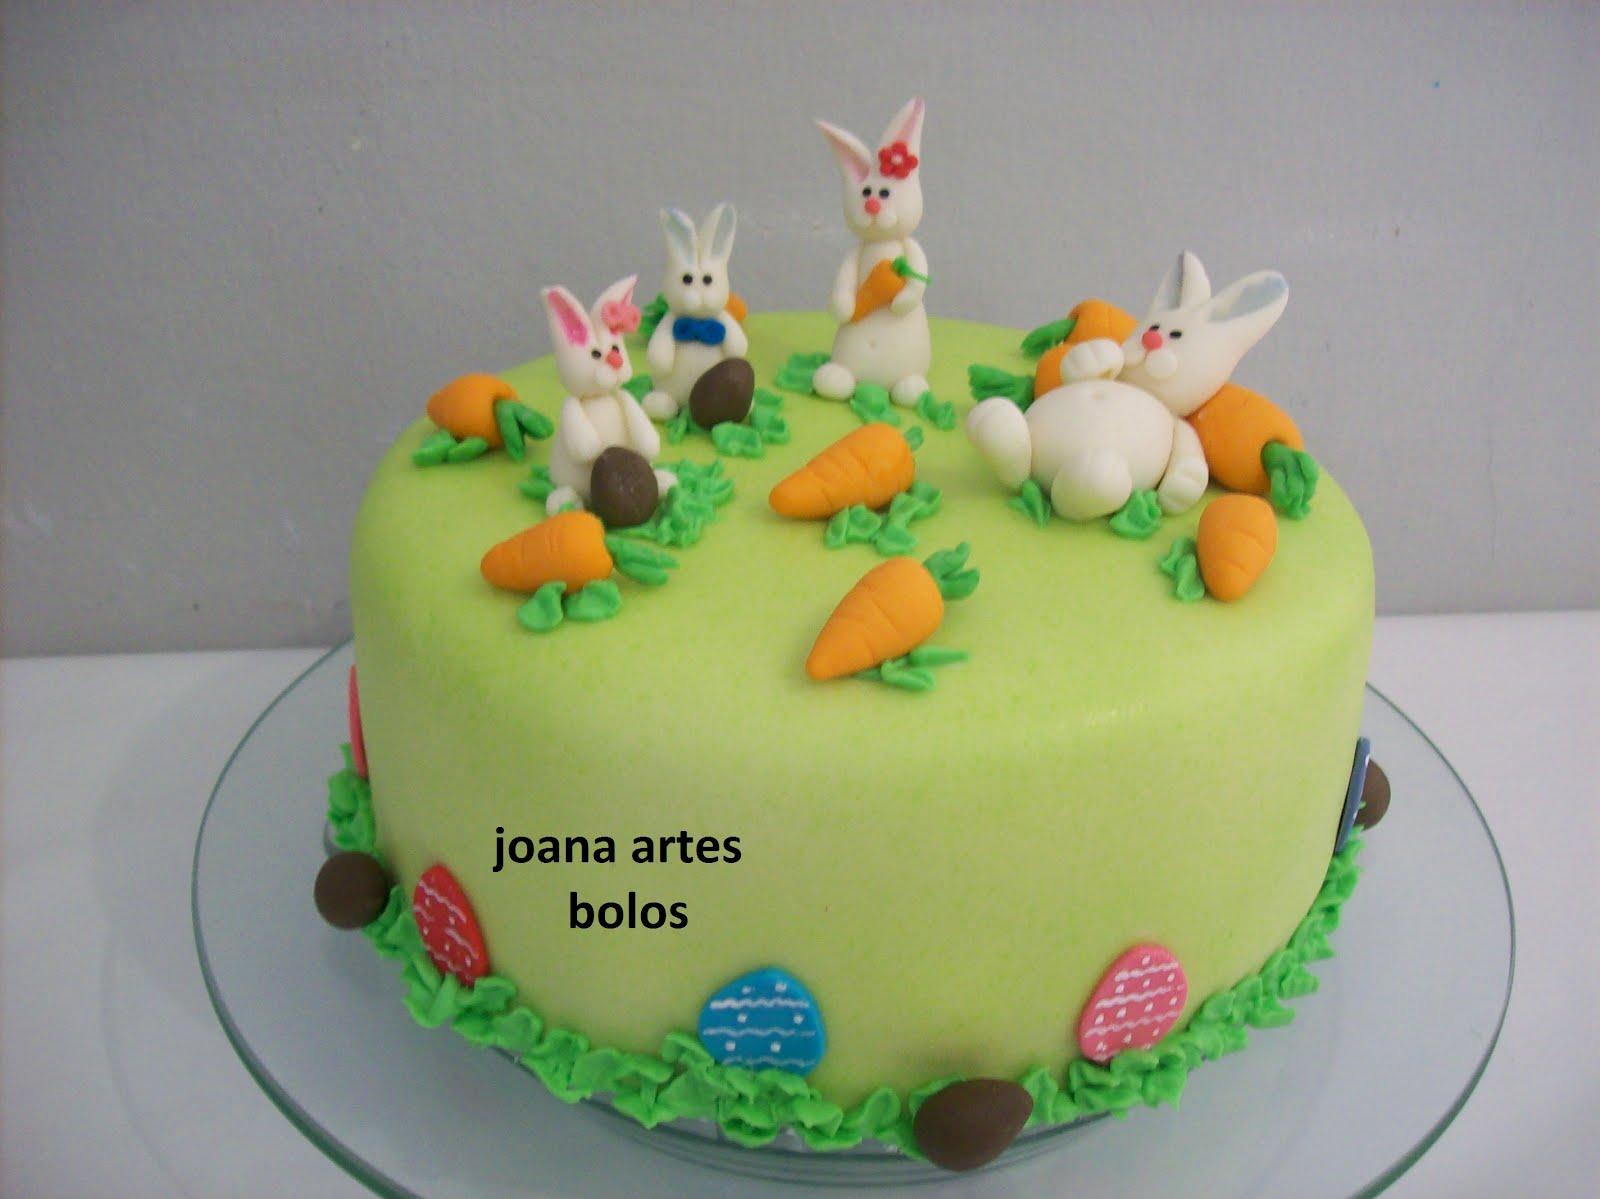 Joana Artes Bolos(Uberaba-MG) 34-33124684